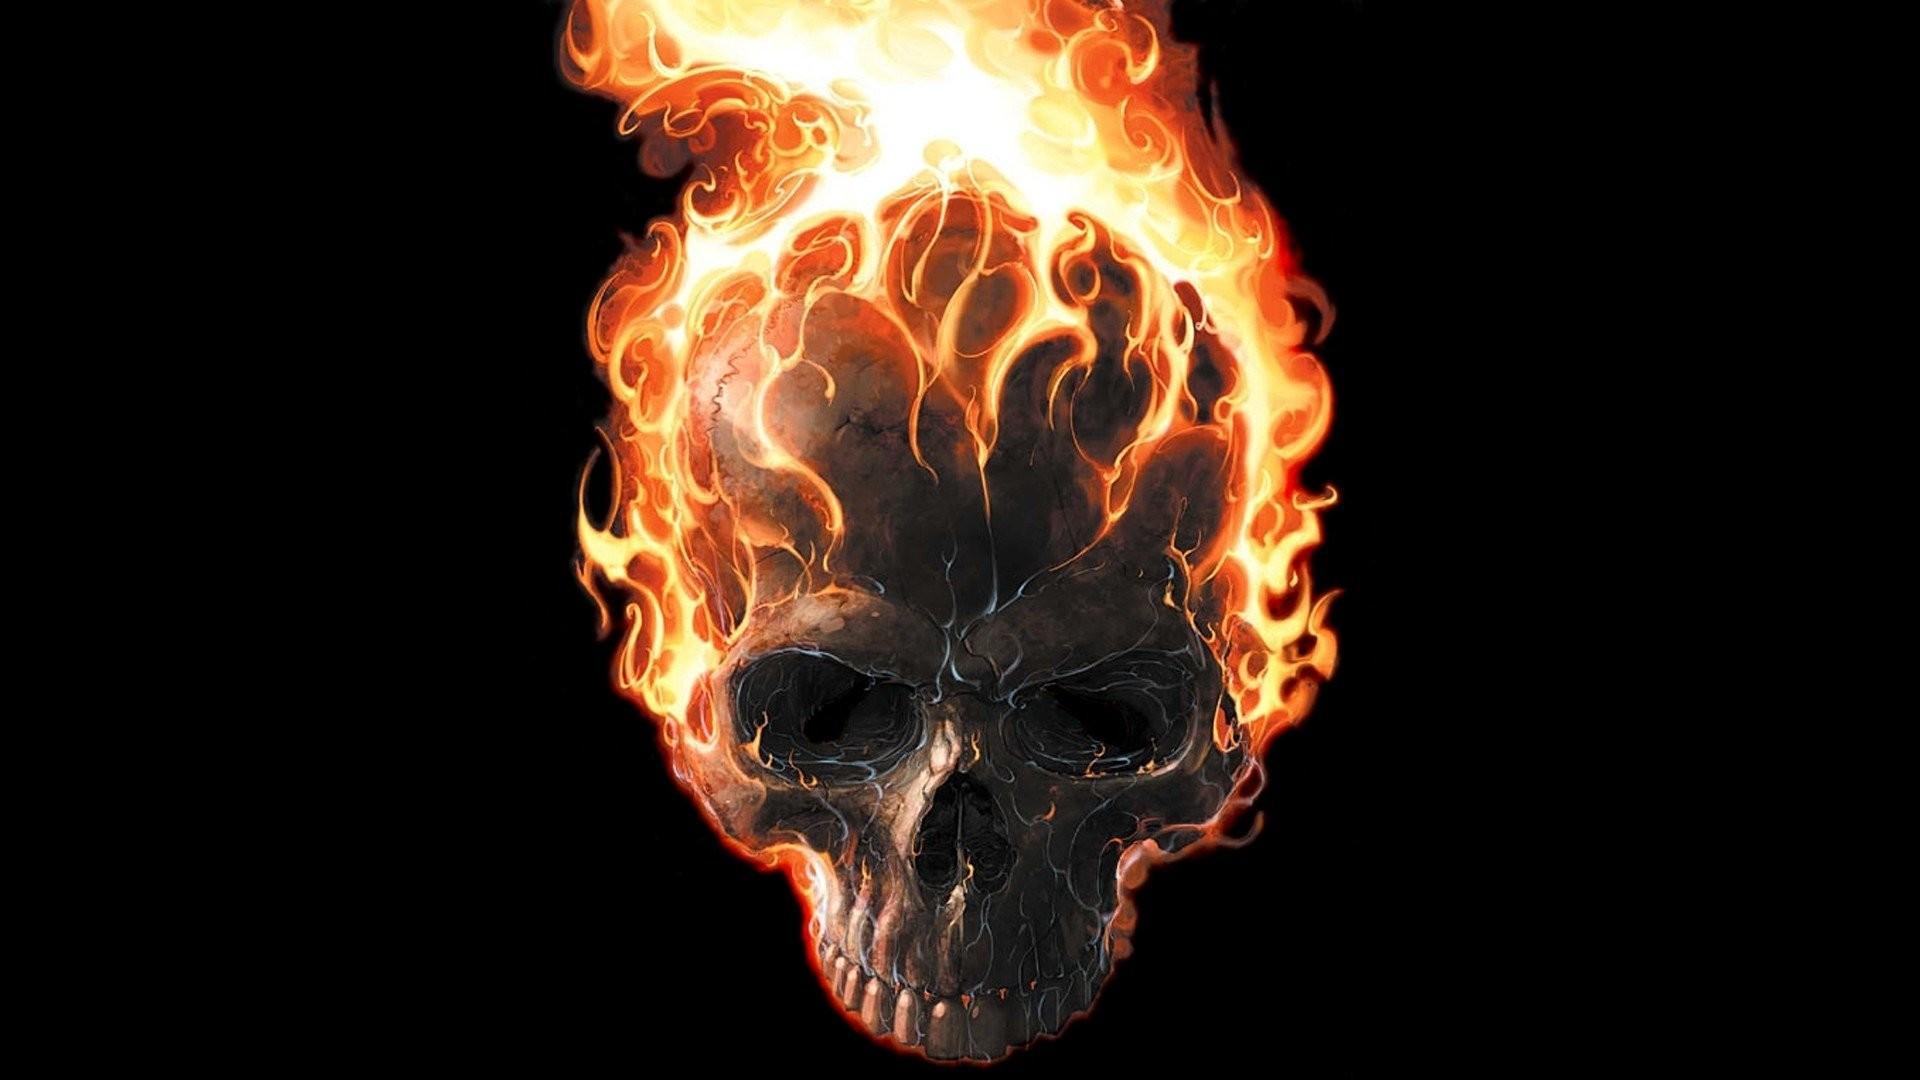 Skulls – Dark Abstract Flaming Black Wallpaper At Dark Wallpapers